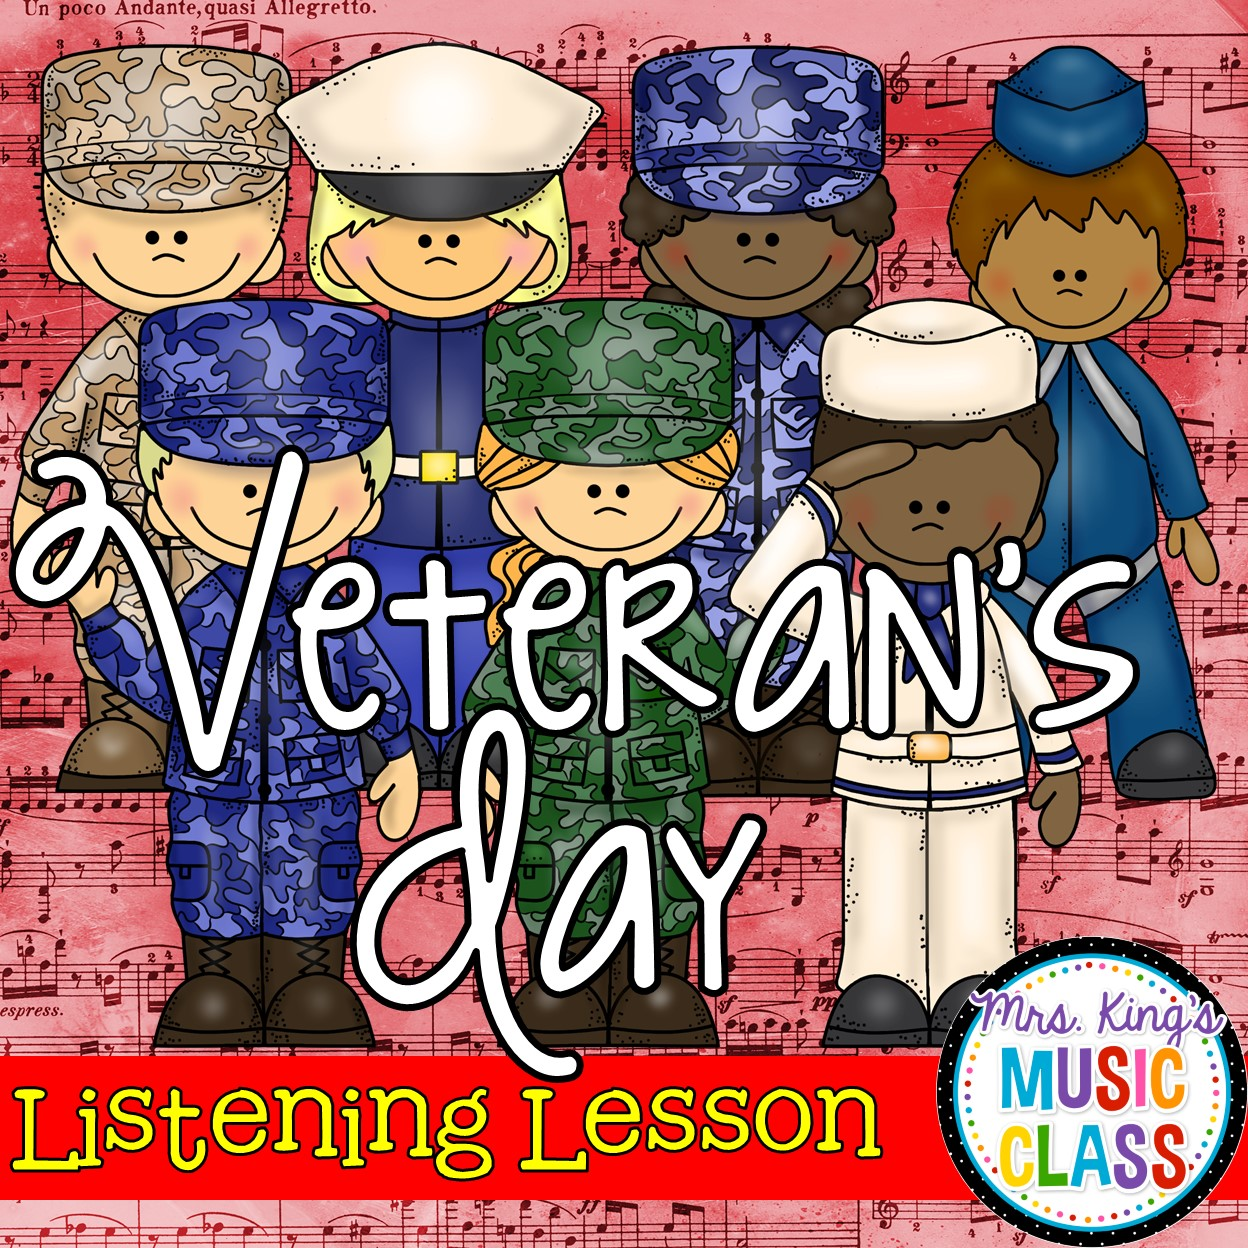 Veterans Day Celebration Ideas